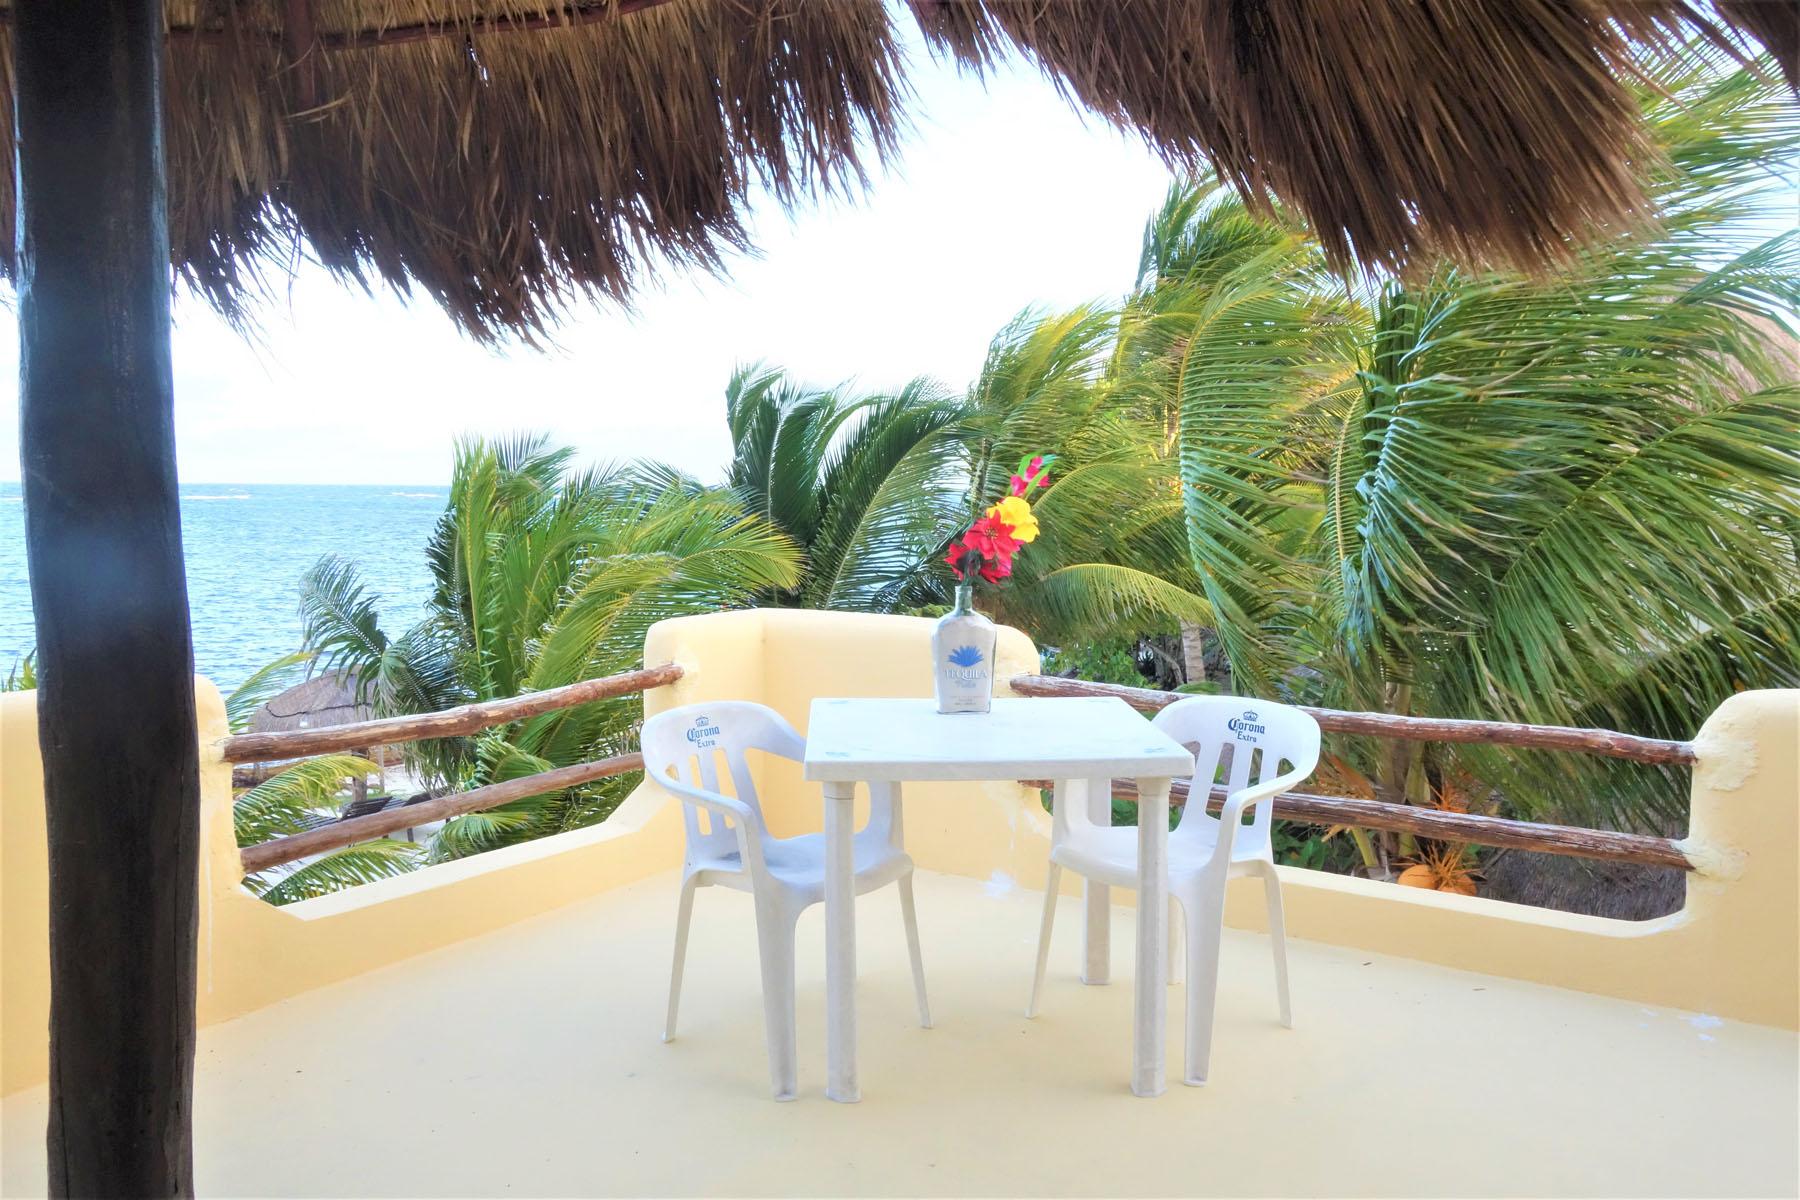 Eco Hotel Restaurant Maya Luna Mahahual. roof terrace